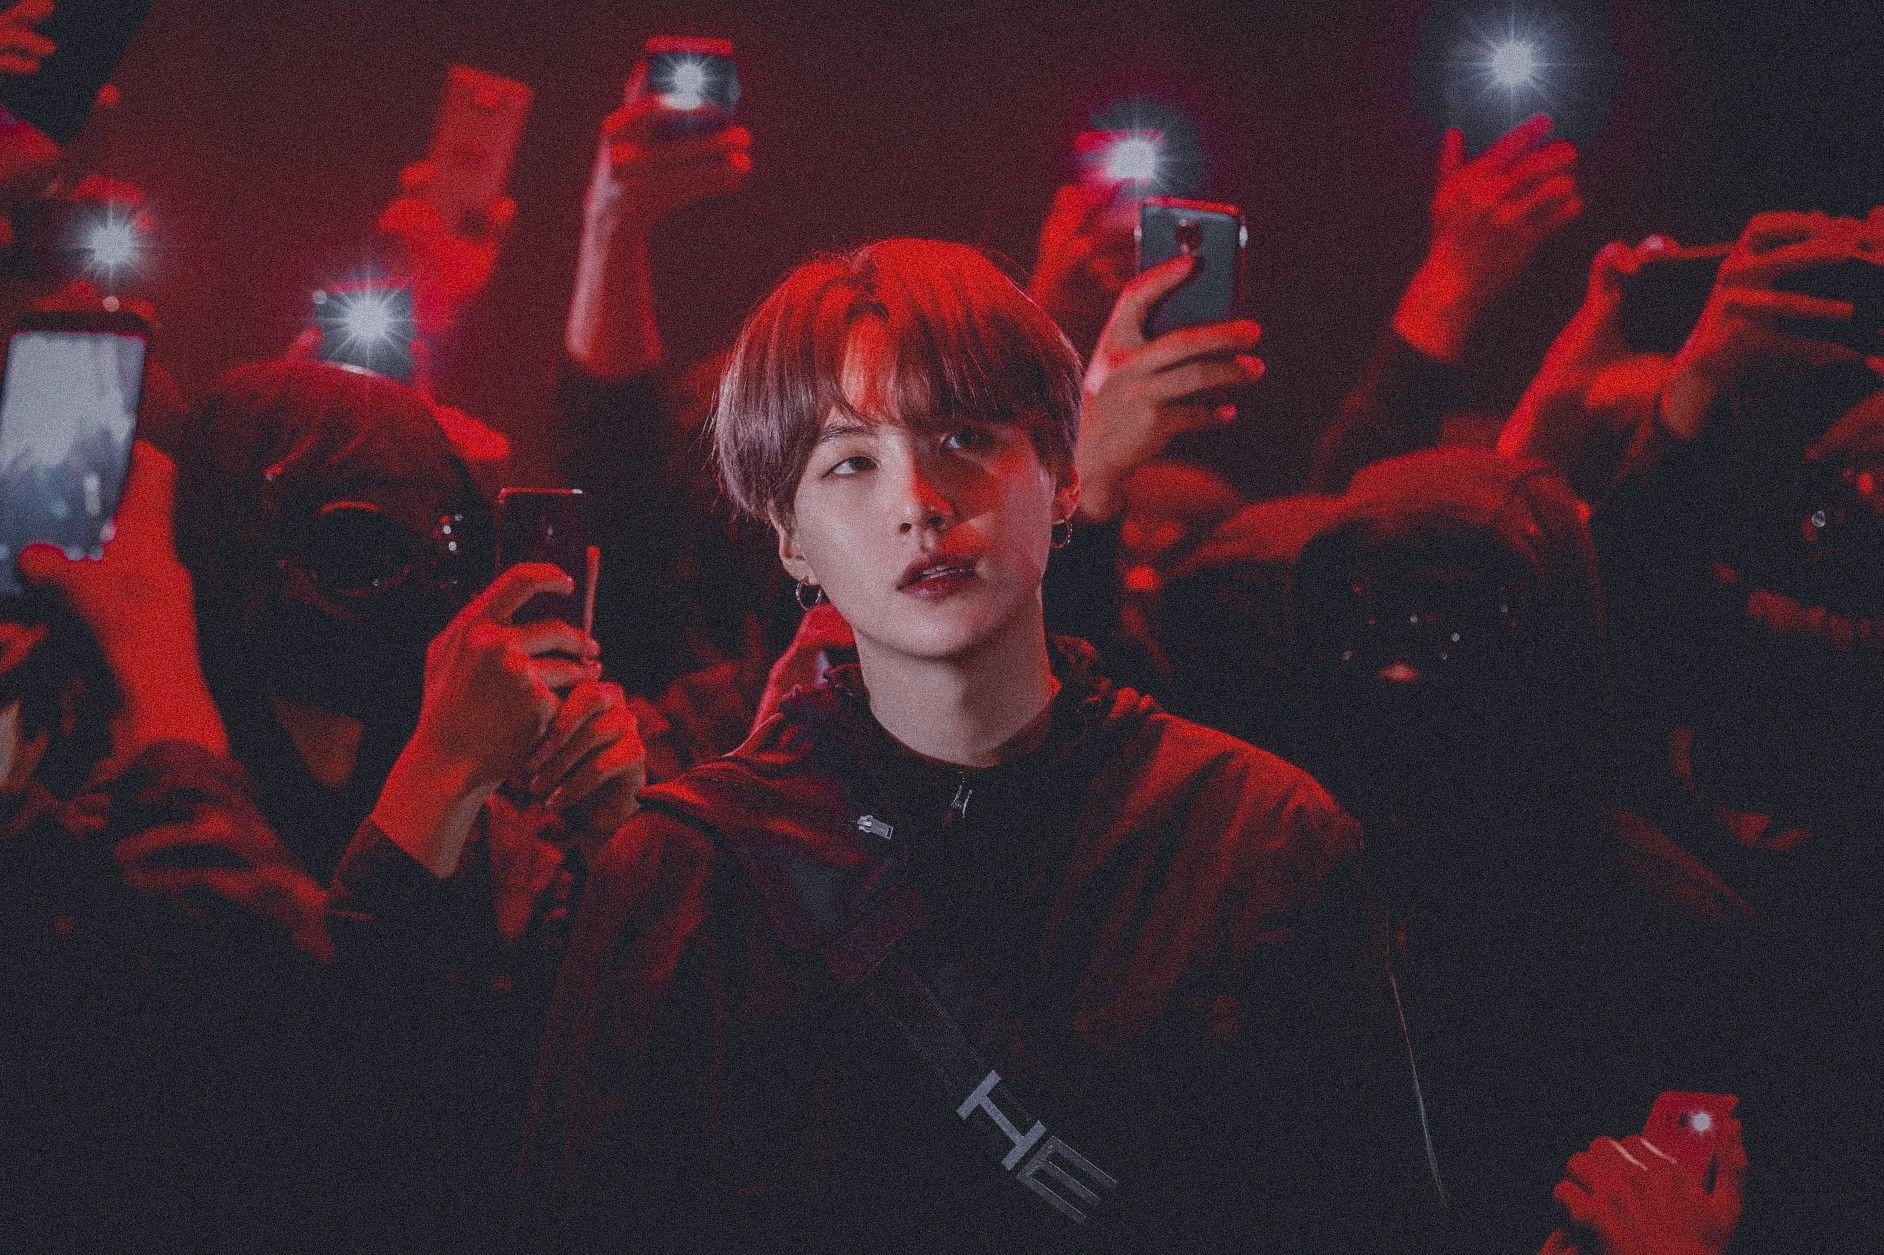 𝒀𝒐𝒐𝒏𝒈𝒊 (𝑩𝑻𝑺) in 2020 Dark aesthetic, Red aesthetic, Yoongi